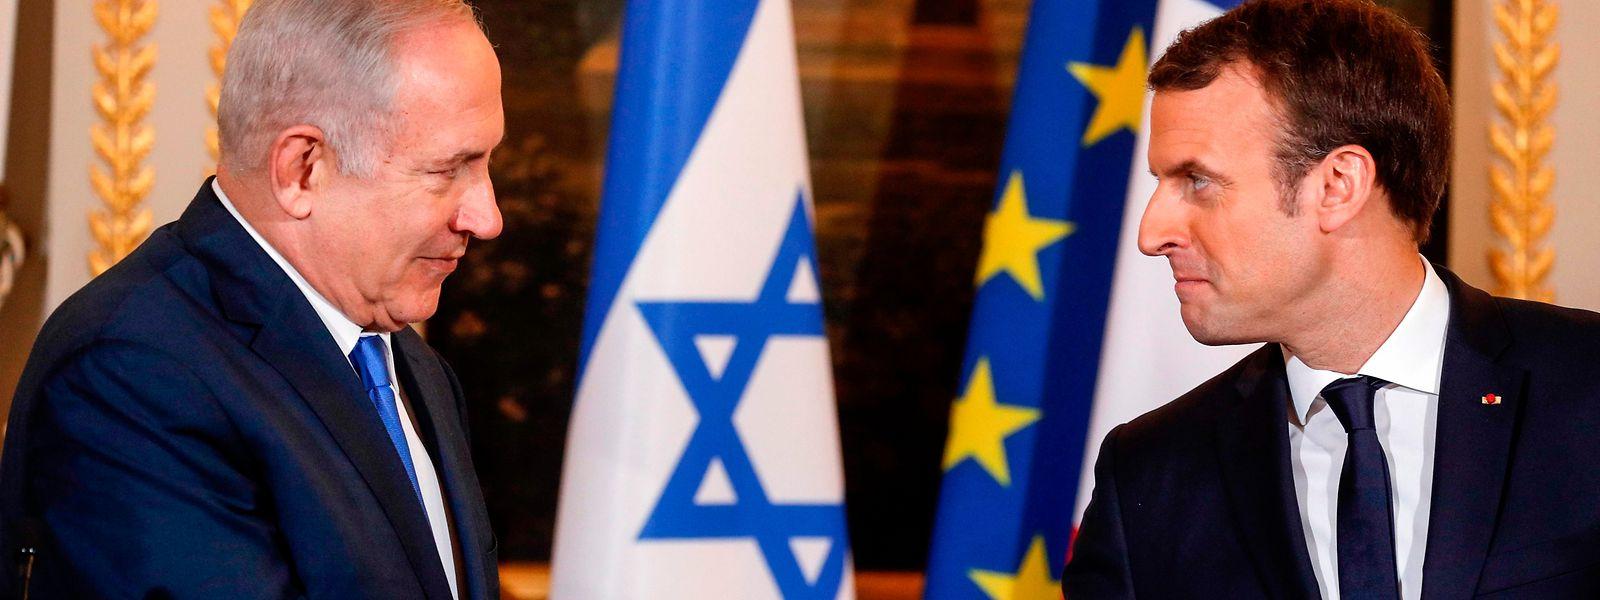 Frostiger Handschlag: Emmanuel Macron (r.) begrüßt Benjamin Netanjahu.